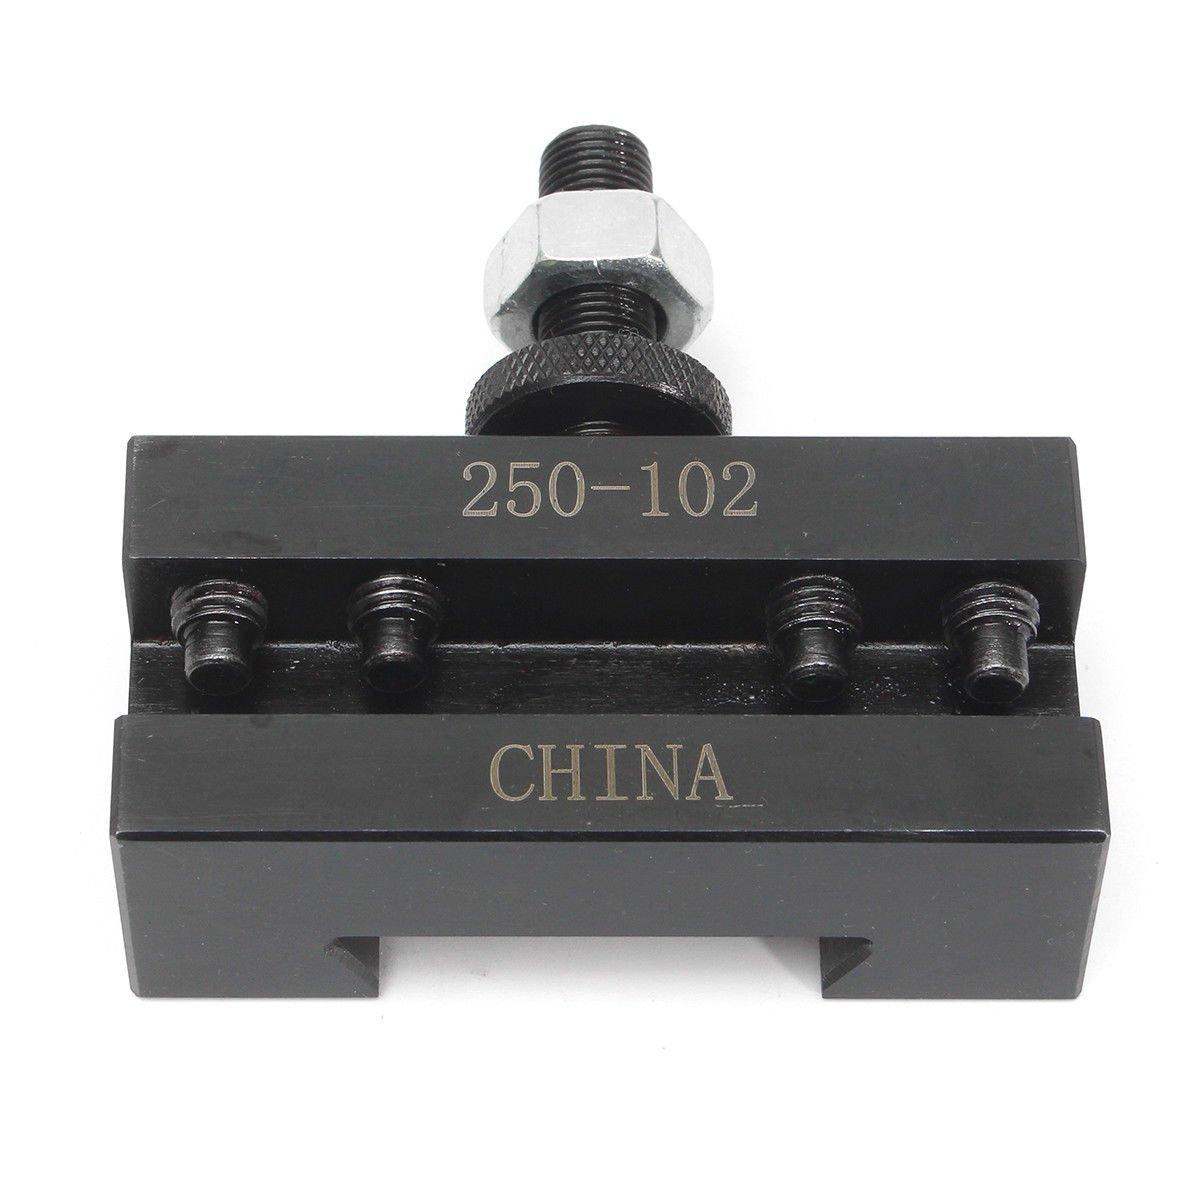 LLDSIMEX 2PC SETS 250-102 6-12'' AXA Quick Change Tool Post Boring Turning Holder #2